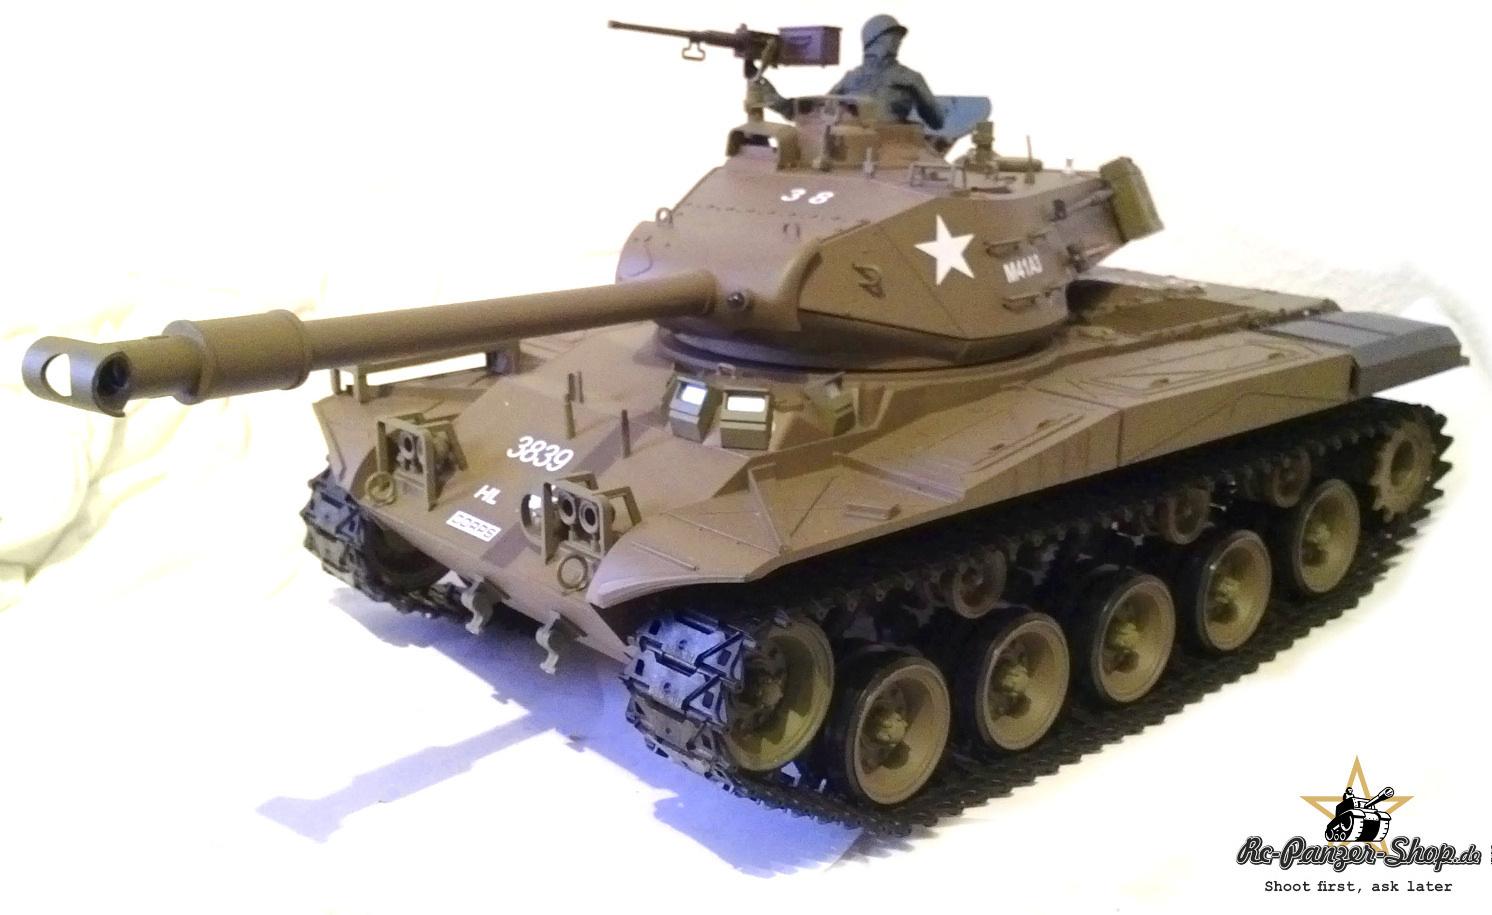 Henglong 1//16 Scale Walker Bulldog RC Tank 3839 Sticker Decal